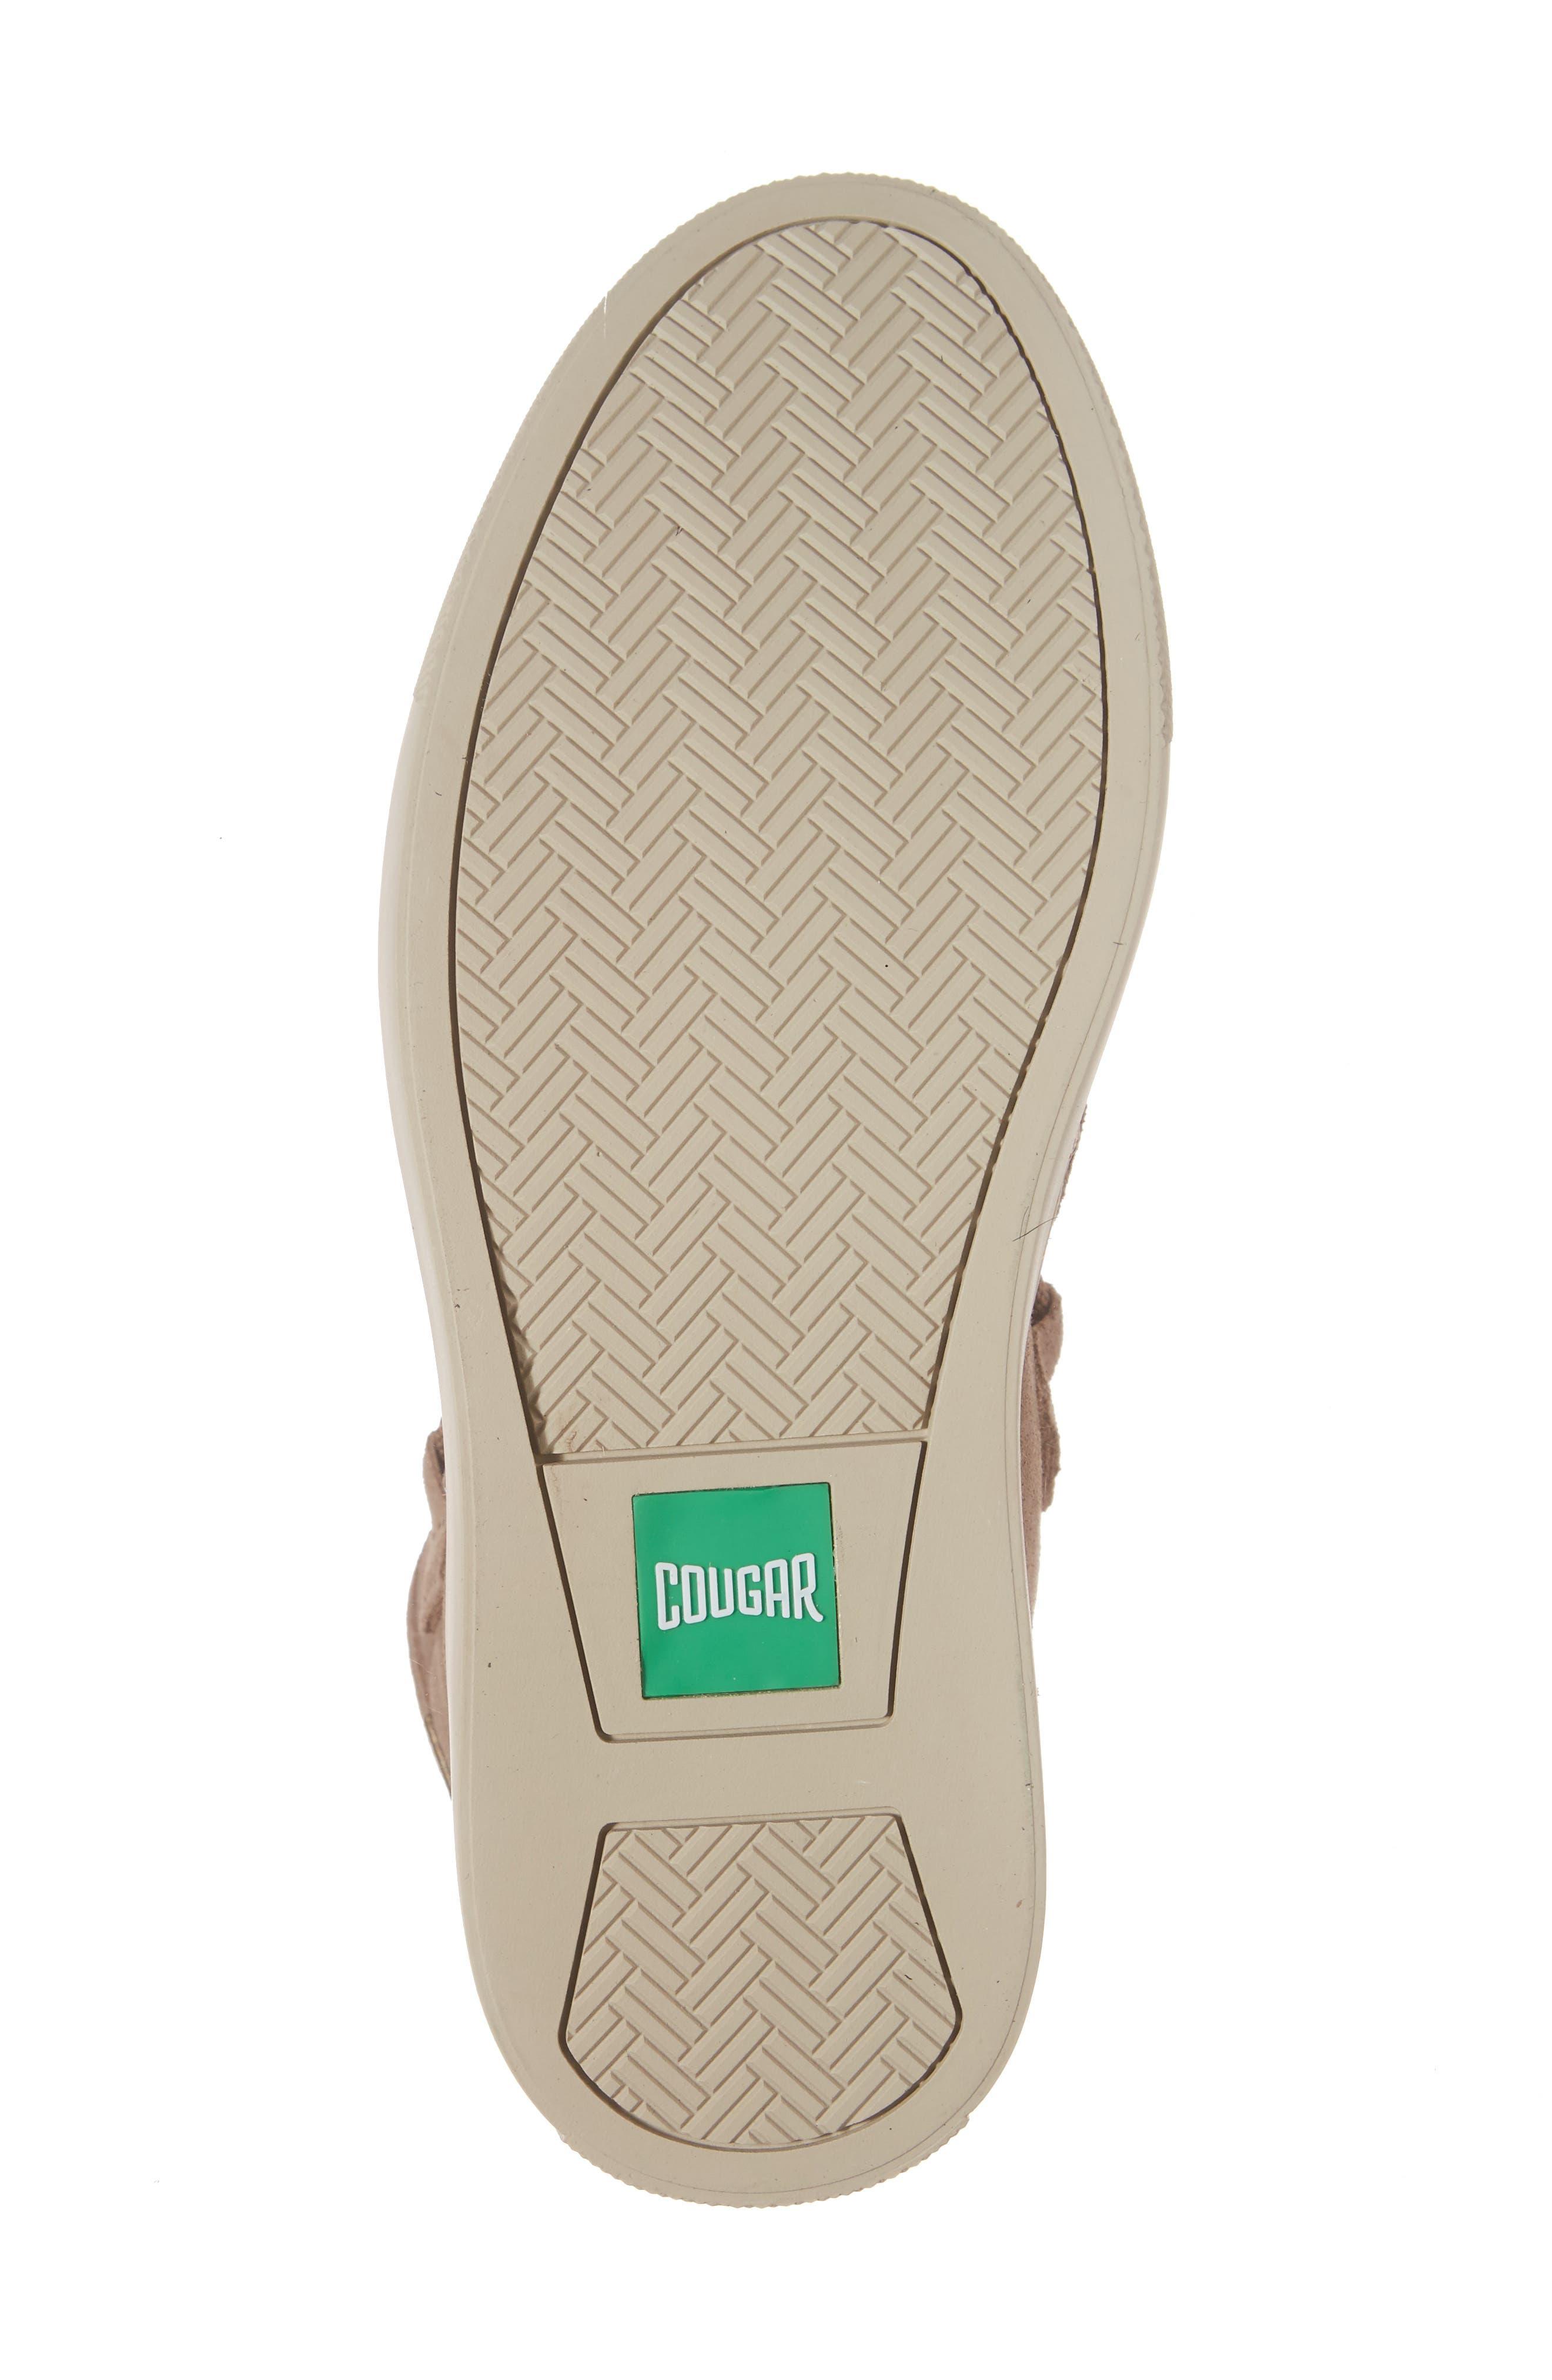 Fabiola Waterproof High Top Sneaker,                             Alternate thumbnail 6, color,                             Taupe Suede